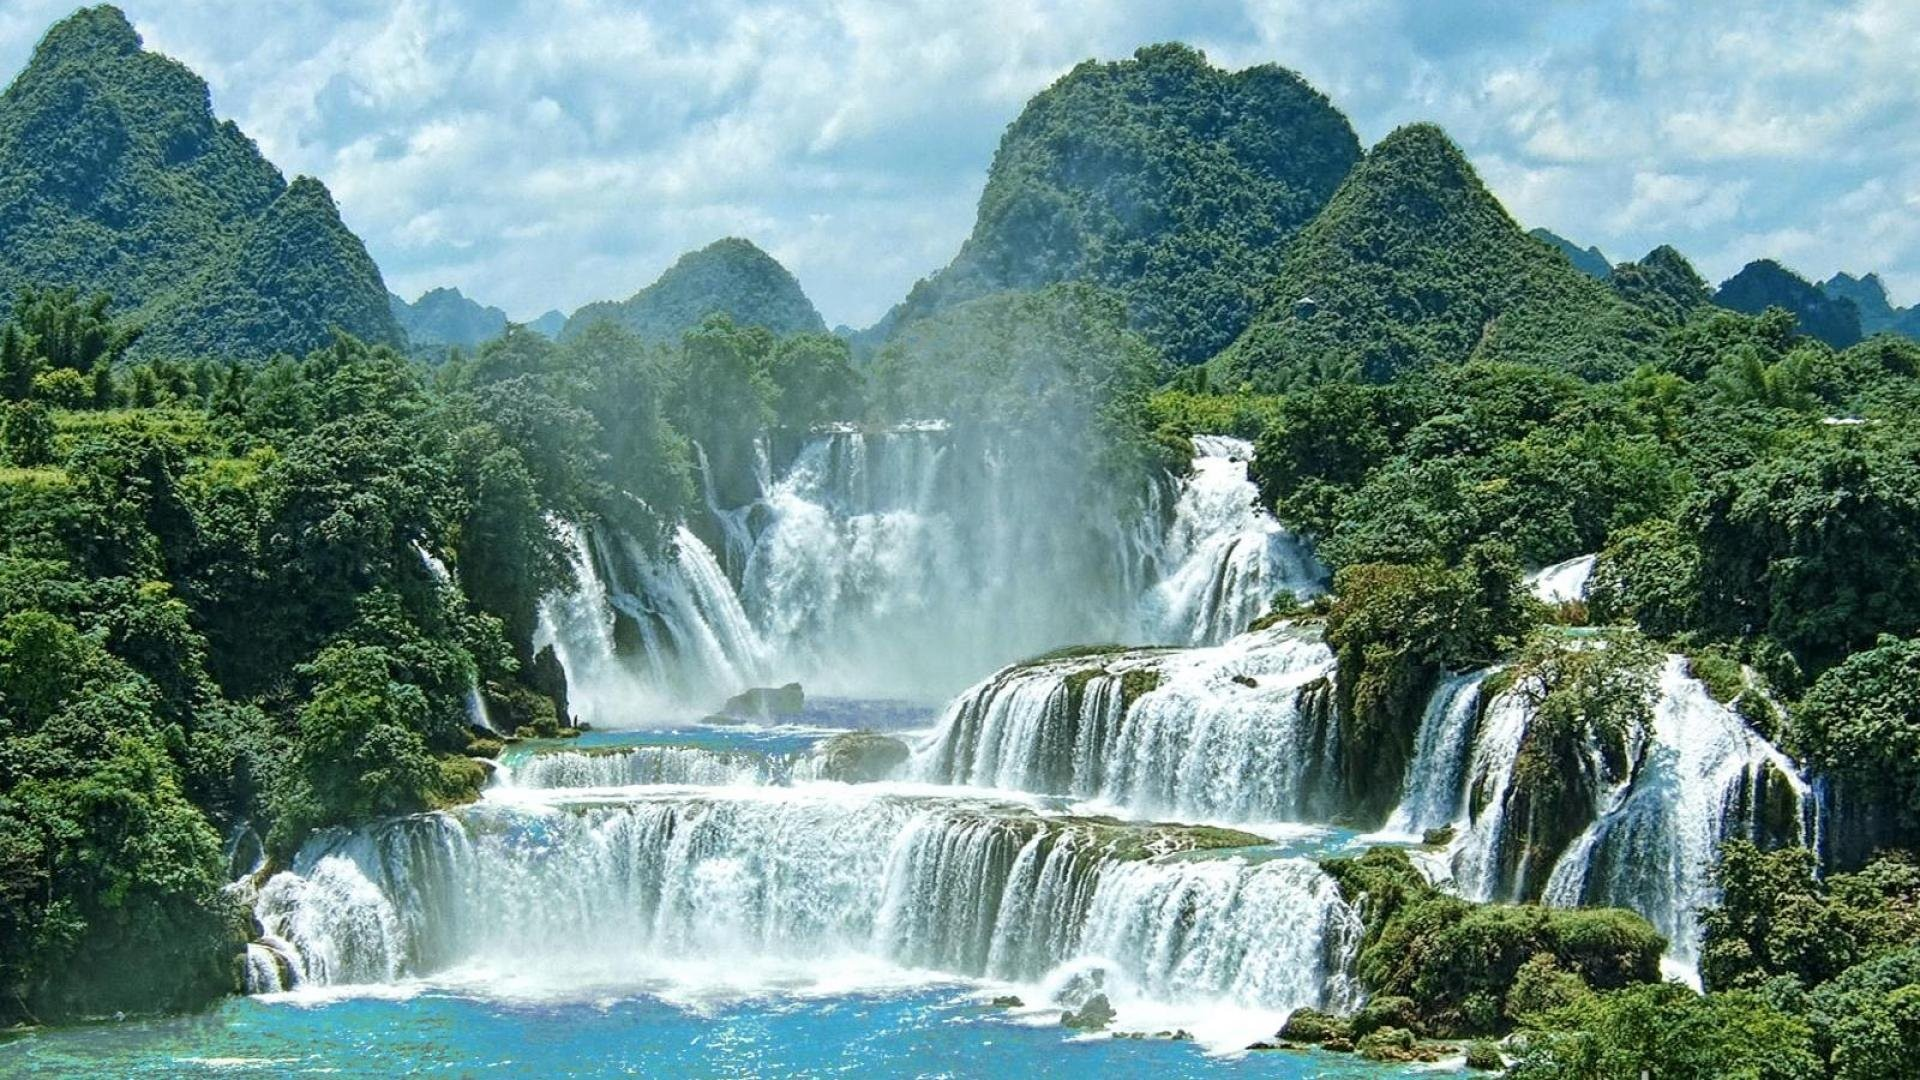 beautiful waterfall scenery wallpapers – photo #7. Screensavers Download  7Screensaverscom